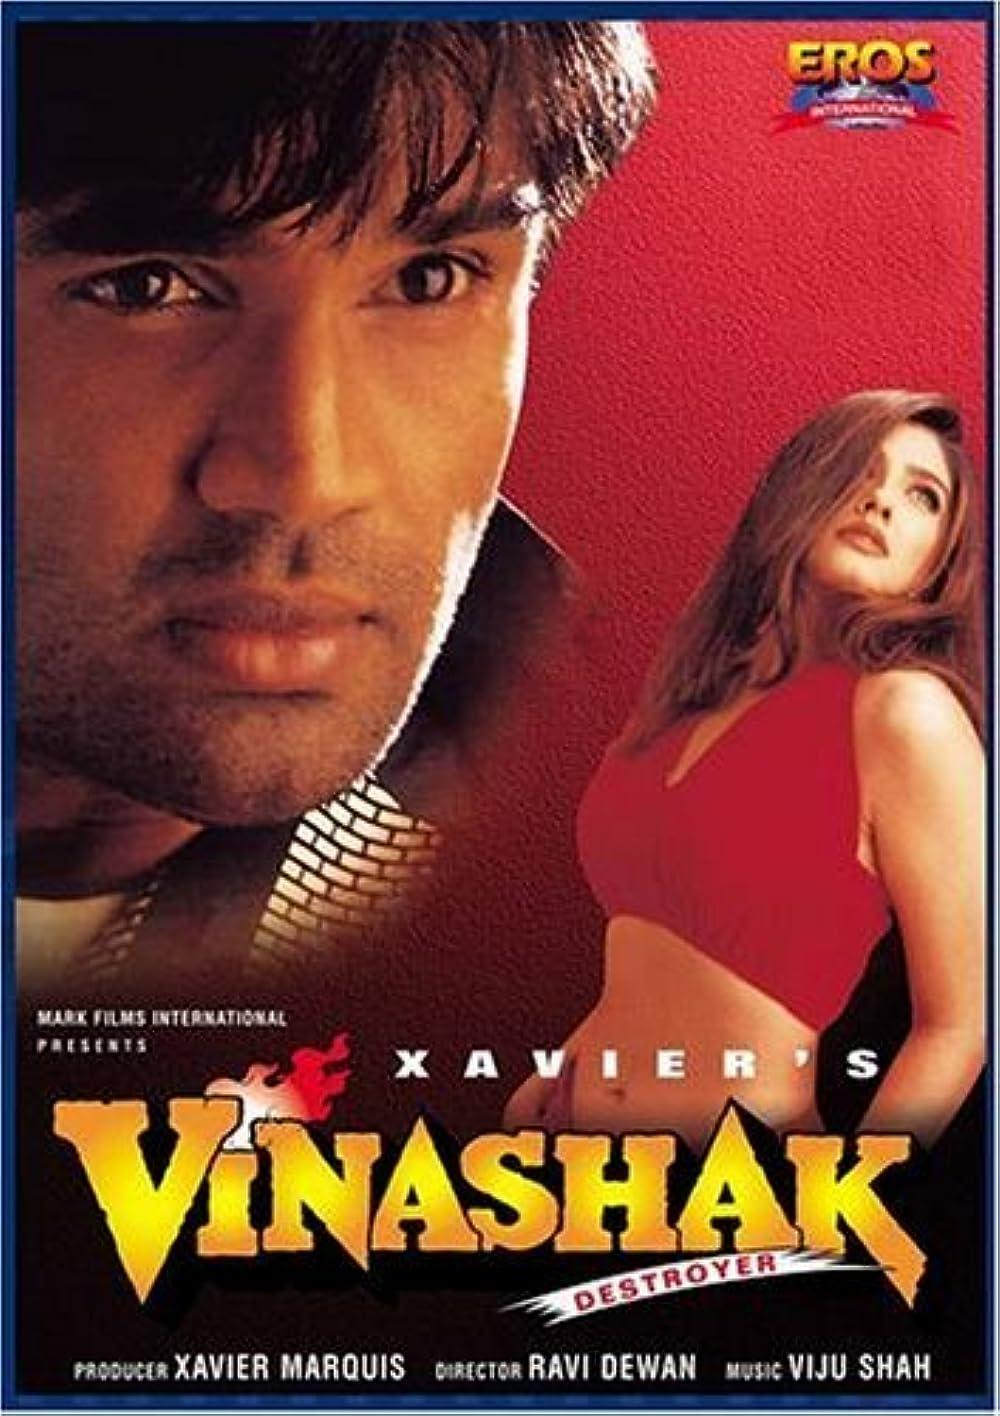 Vinashak Destroyer 1998 Hindi Movie 720p HDRip ESub 1.2GB | 420MB Download